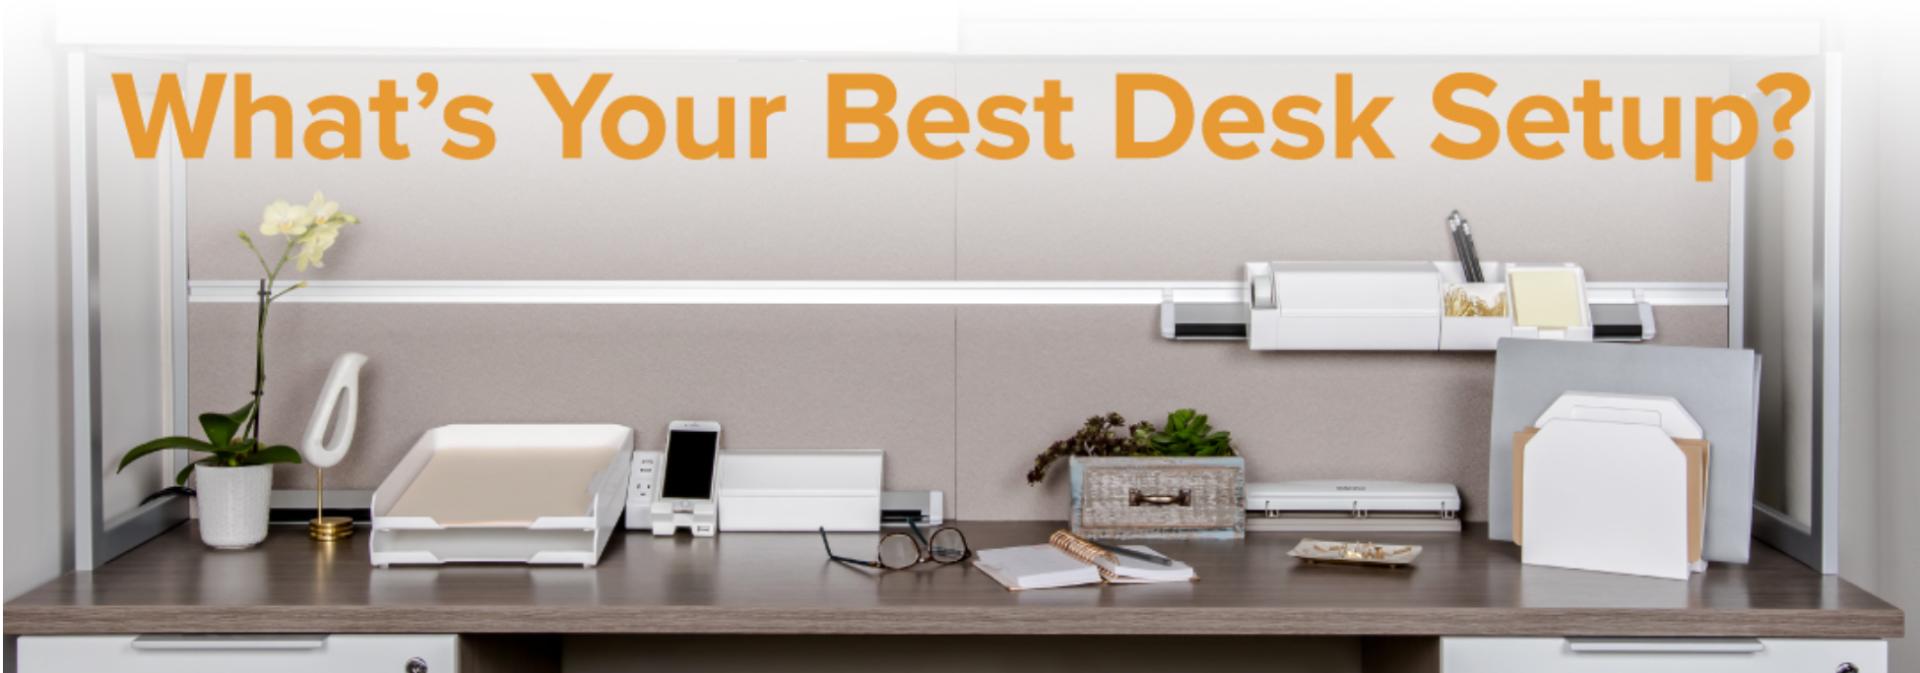 What's Your Best Desk Setup?